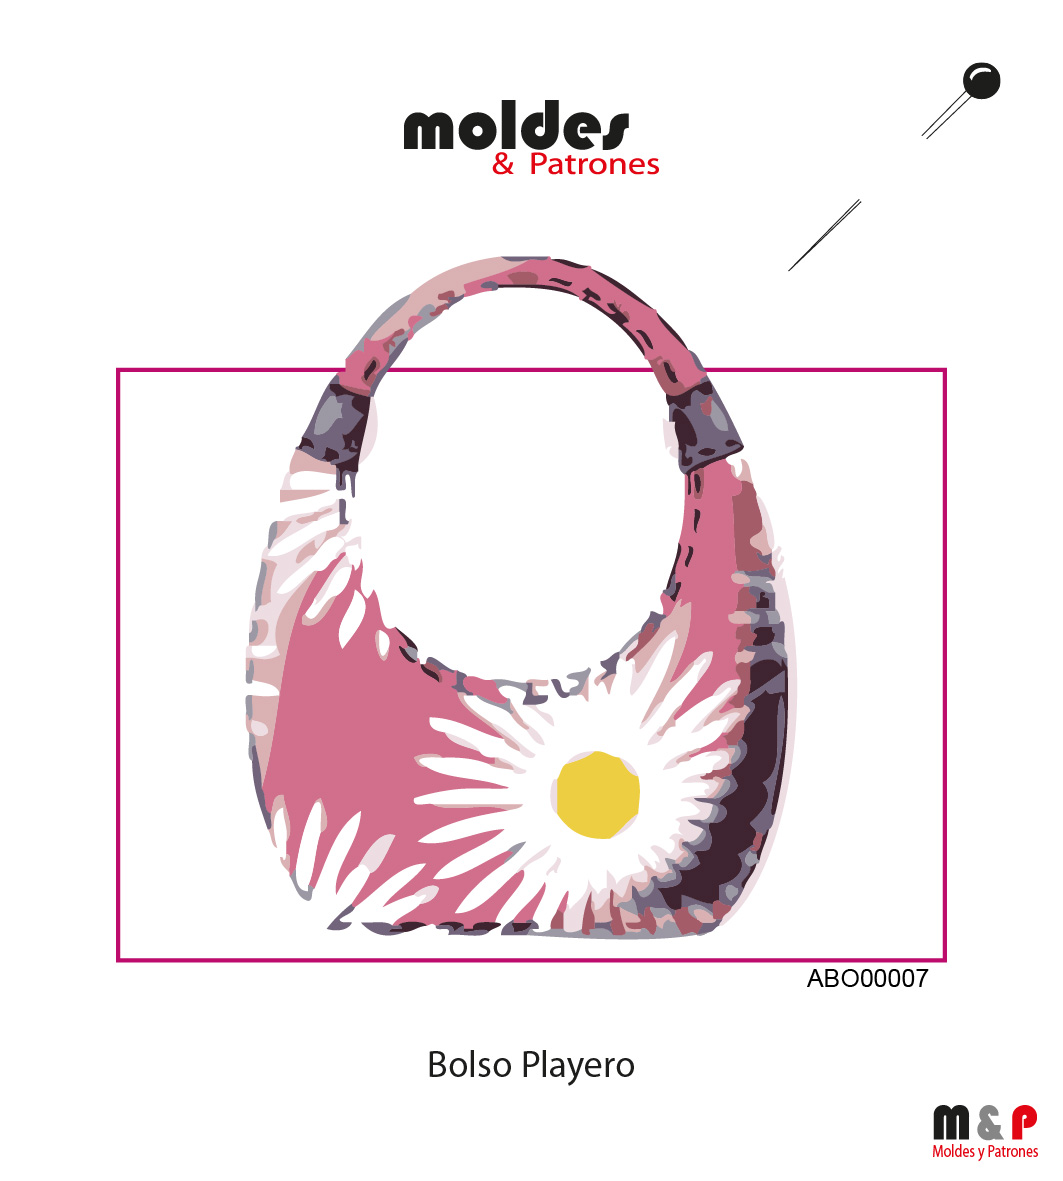 Bolso Playero